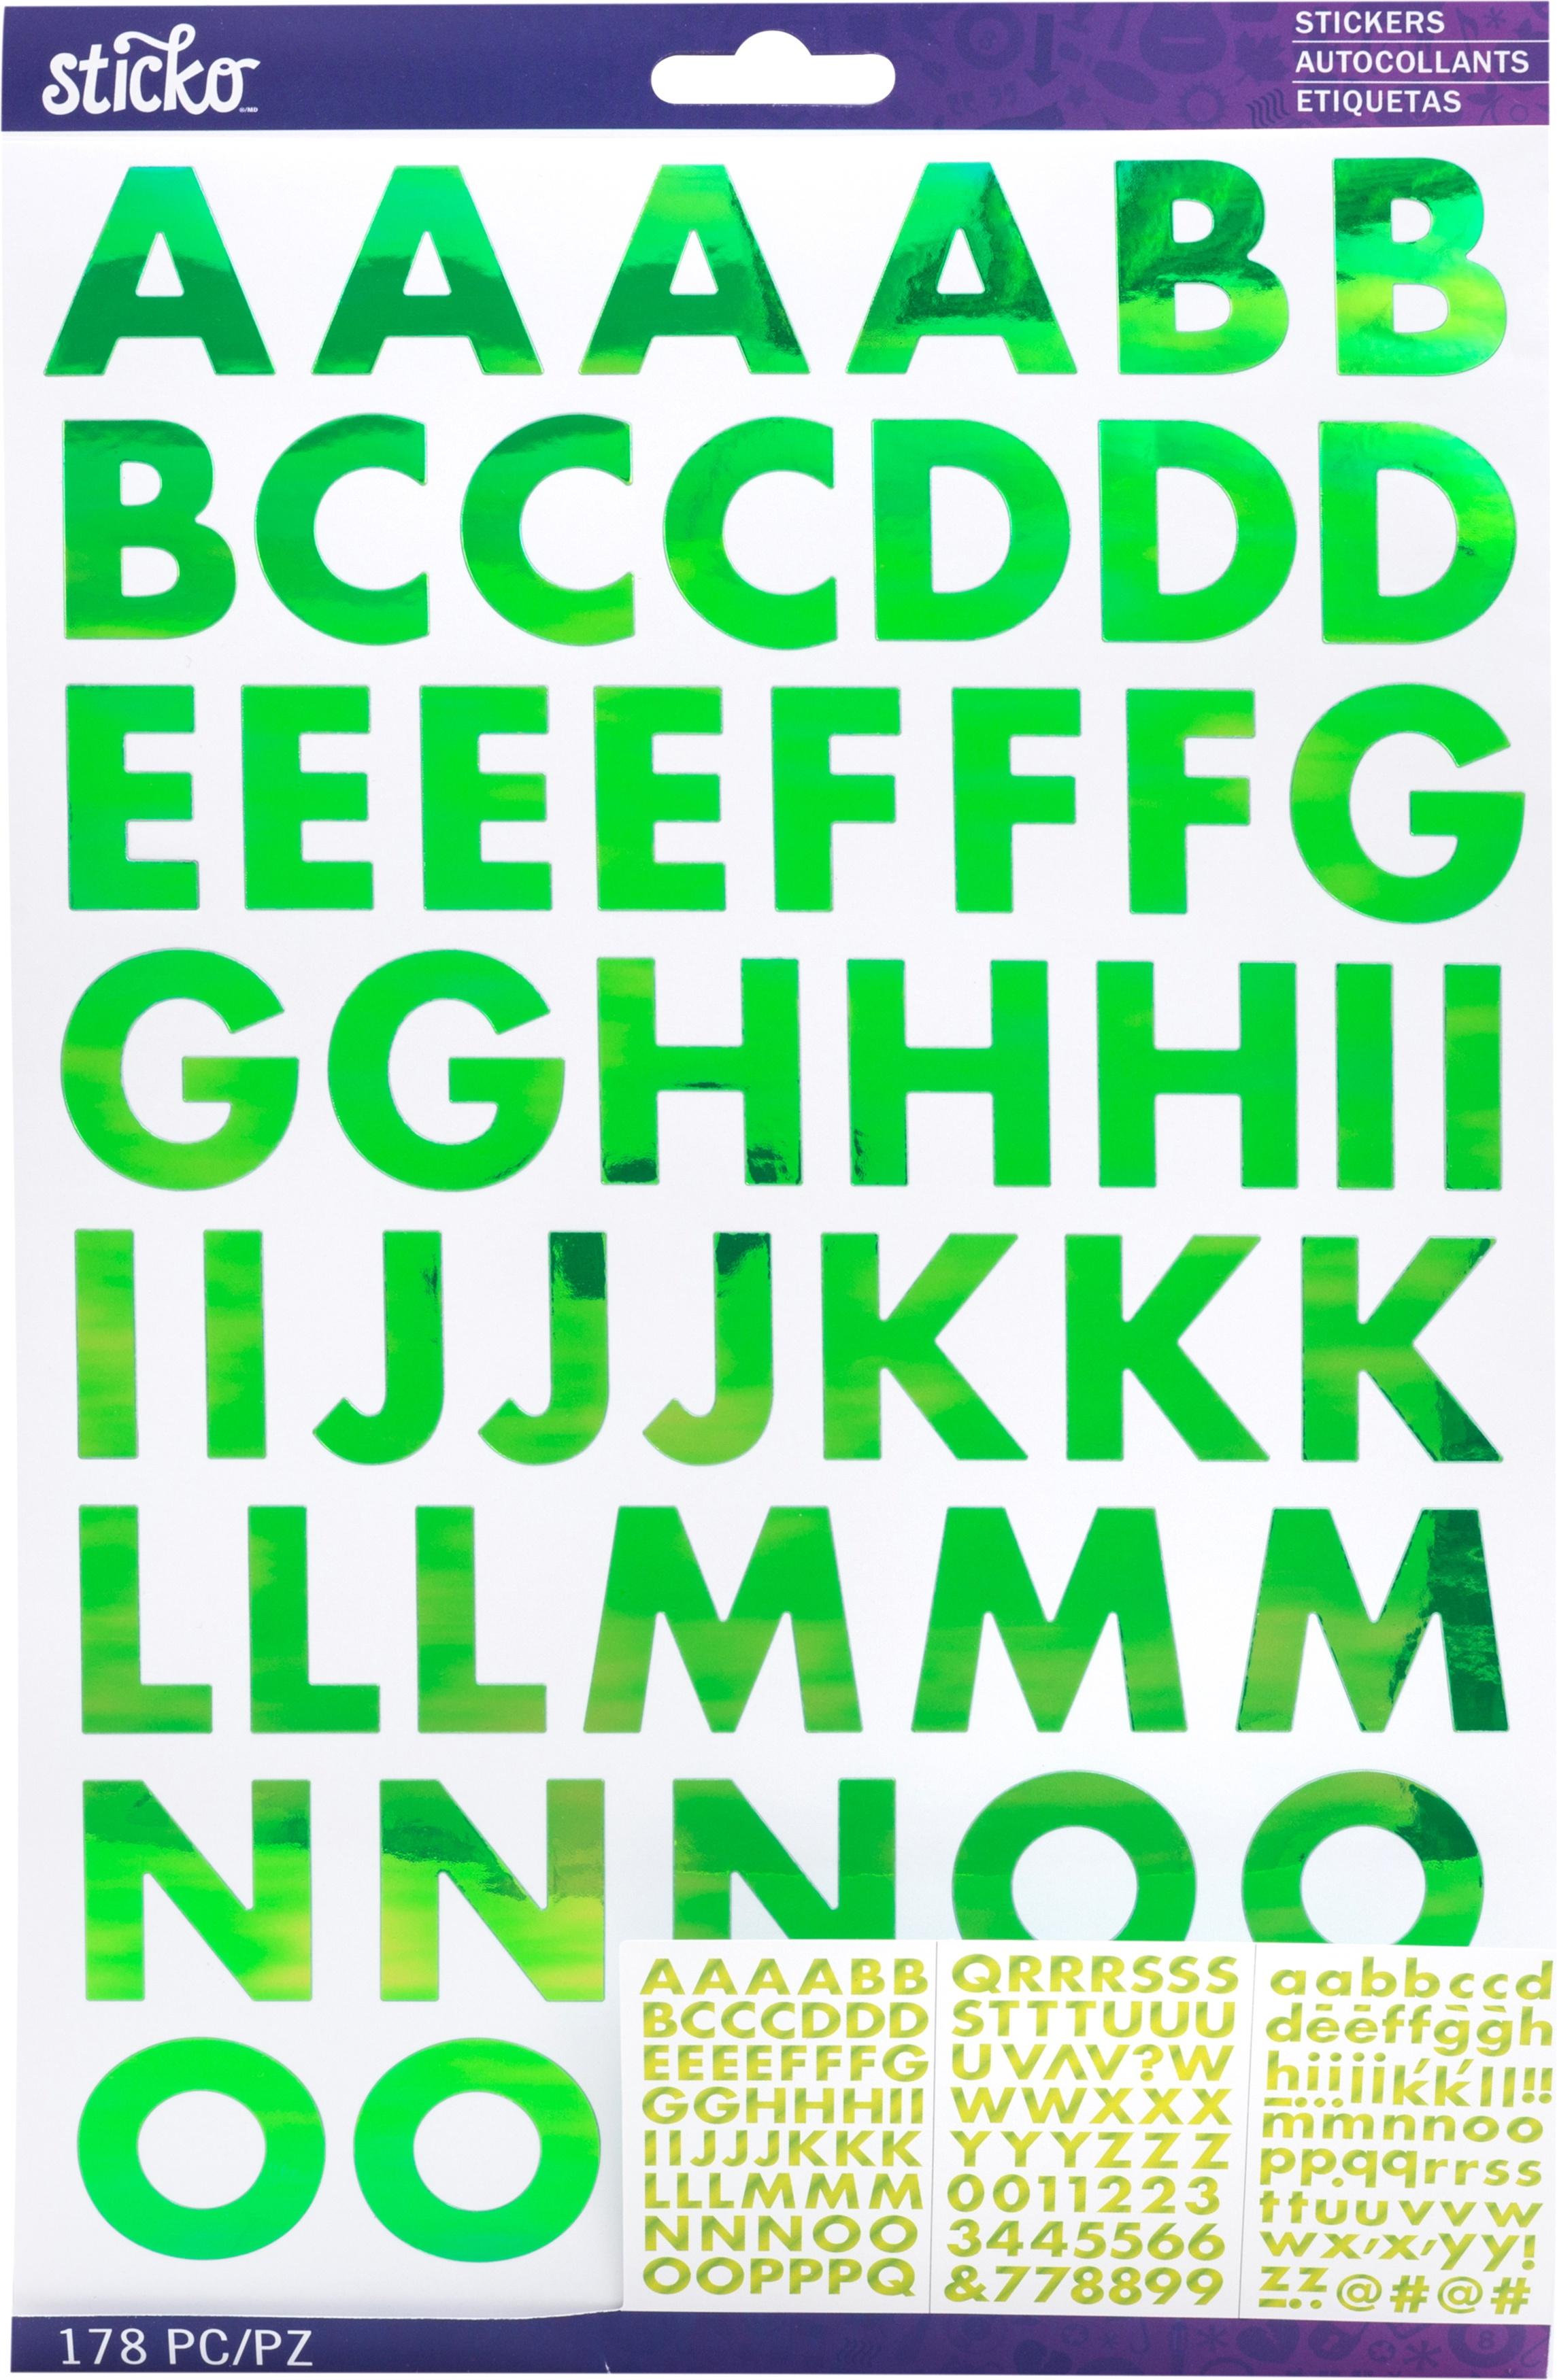 Sticko Iridescent Large Alphabet Stickers-Green Futura